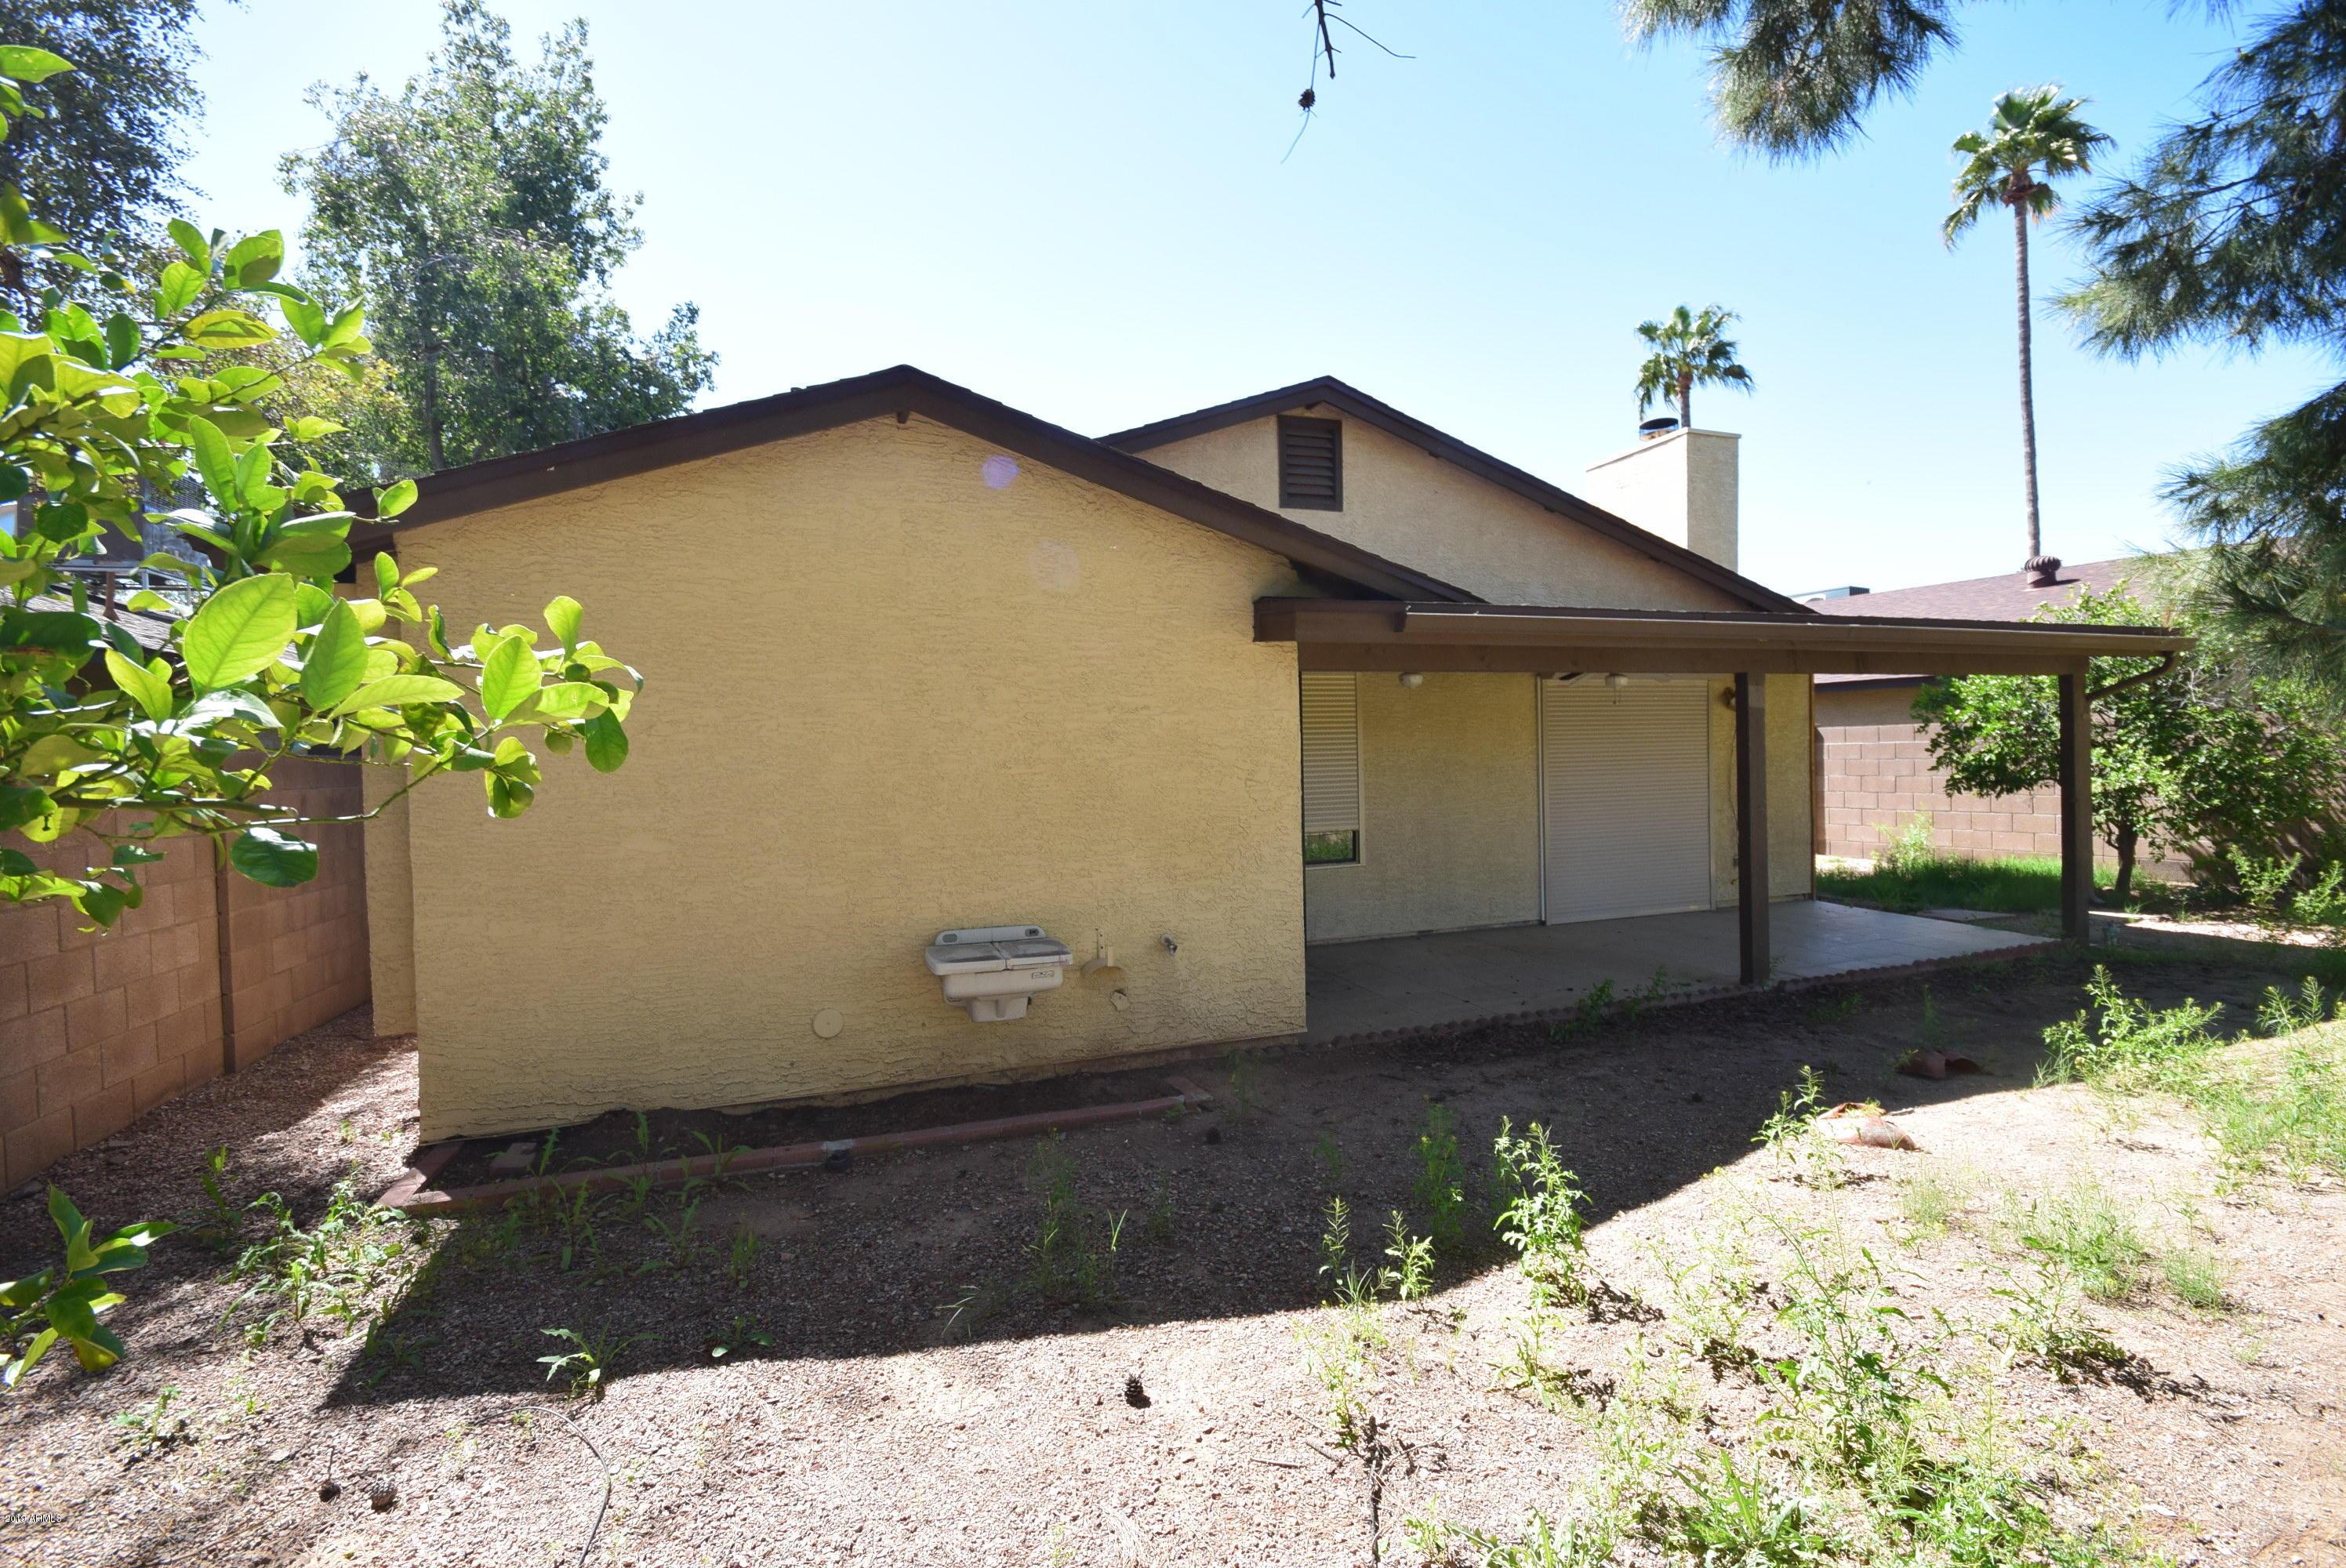 MLS 5915819 4824 W SIERRA VISTA Drive, Glendale, AZ 85301 Glendale AZ REO Bank Owned Foreclosure